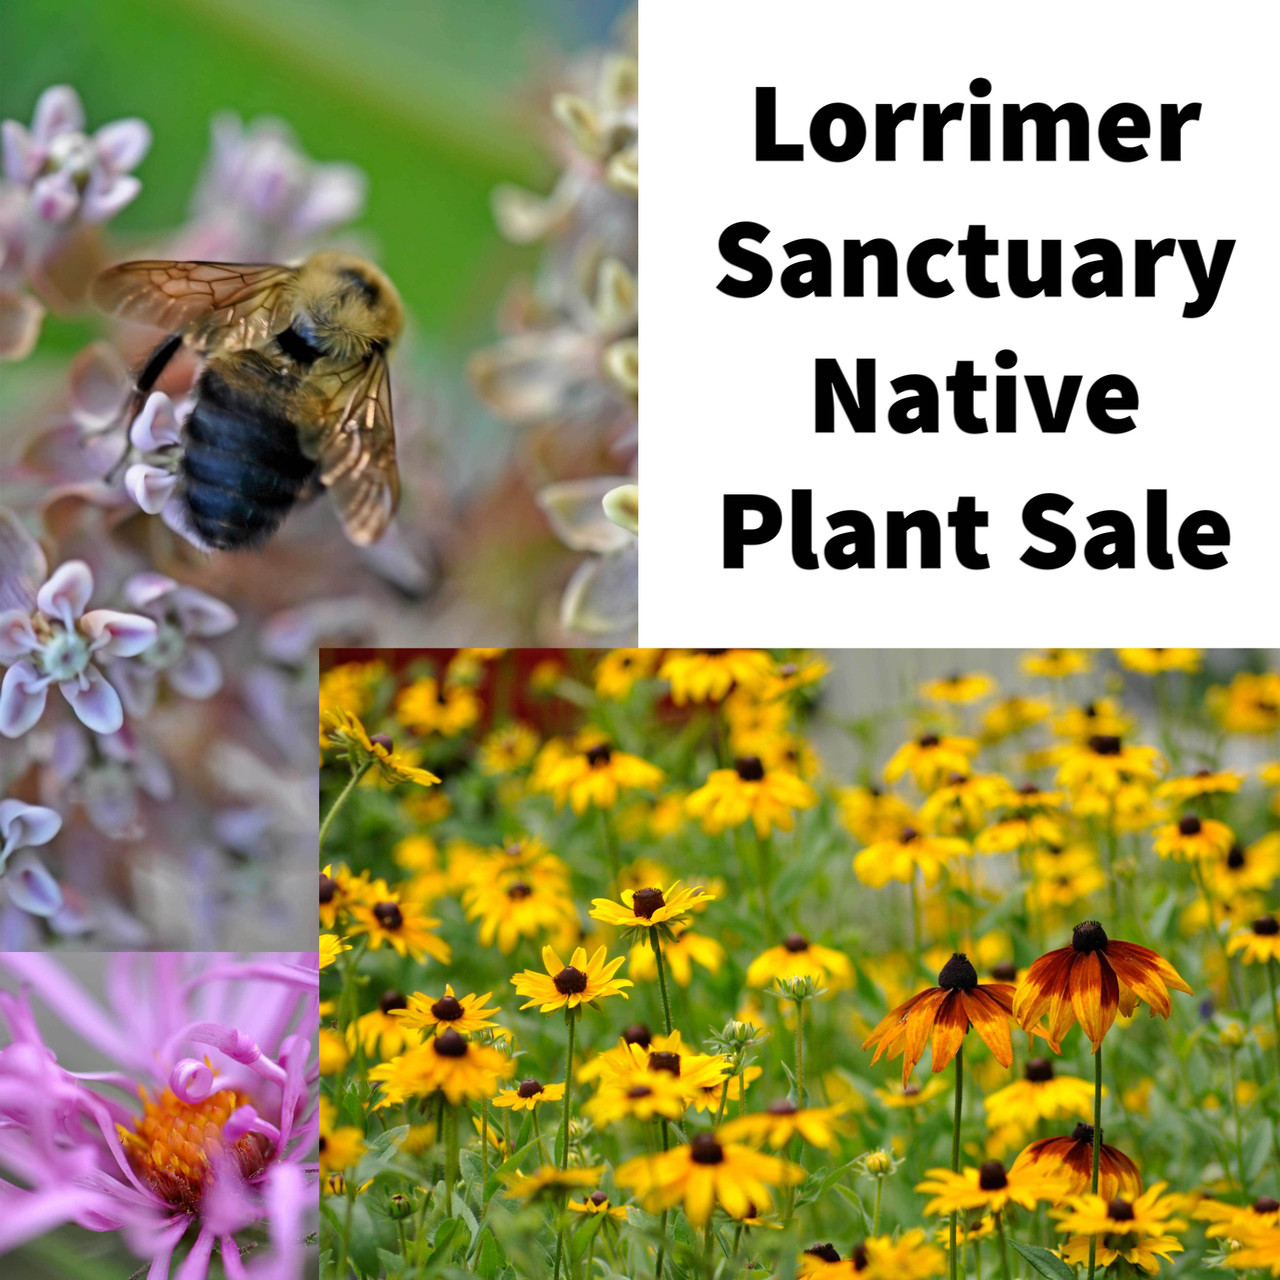 Lorrimer Sanctuary